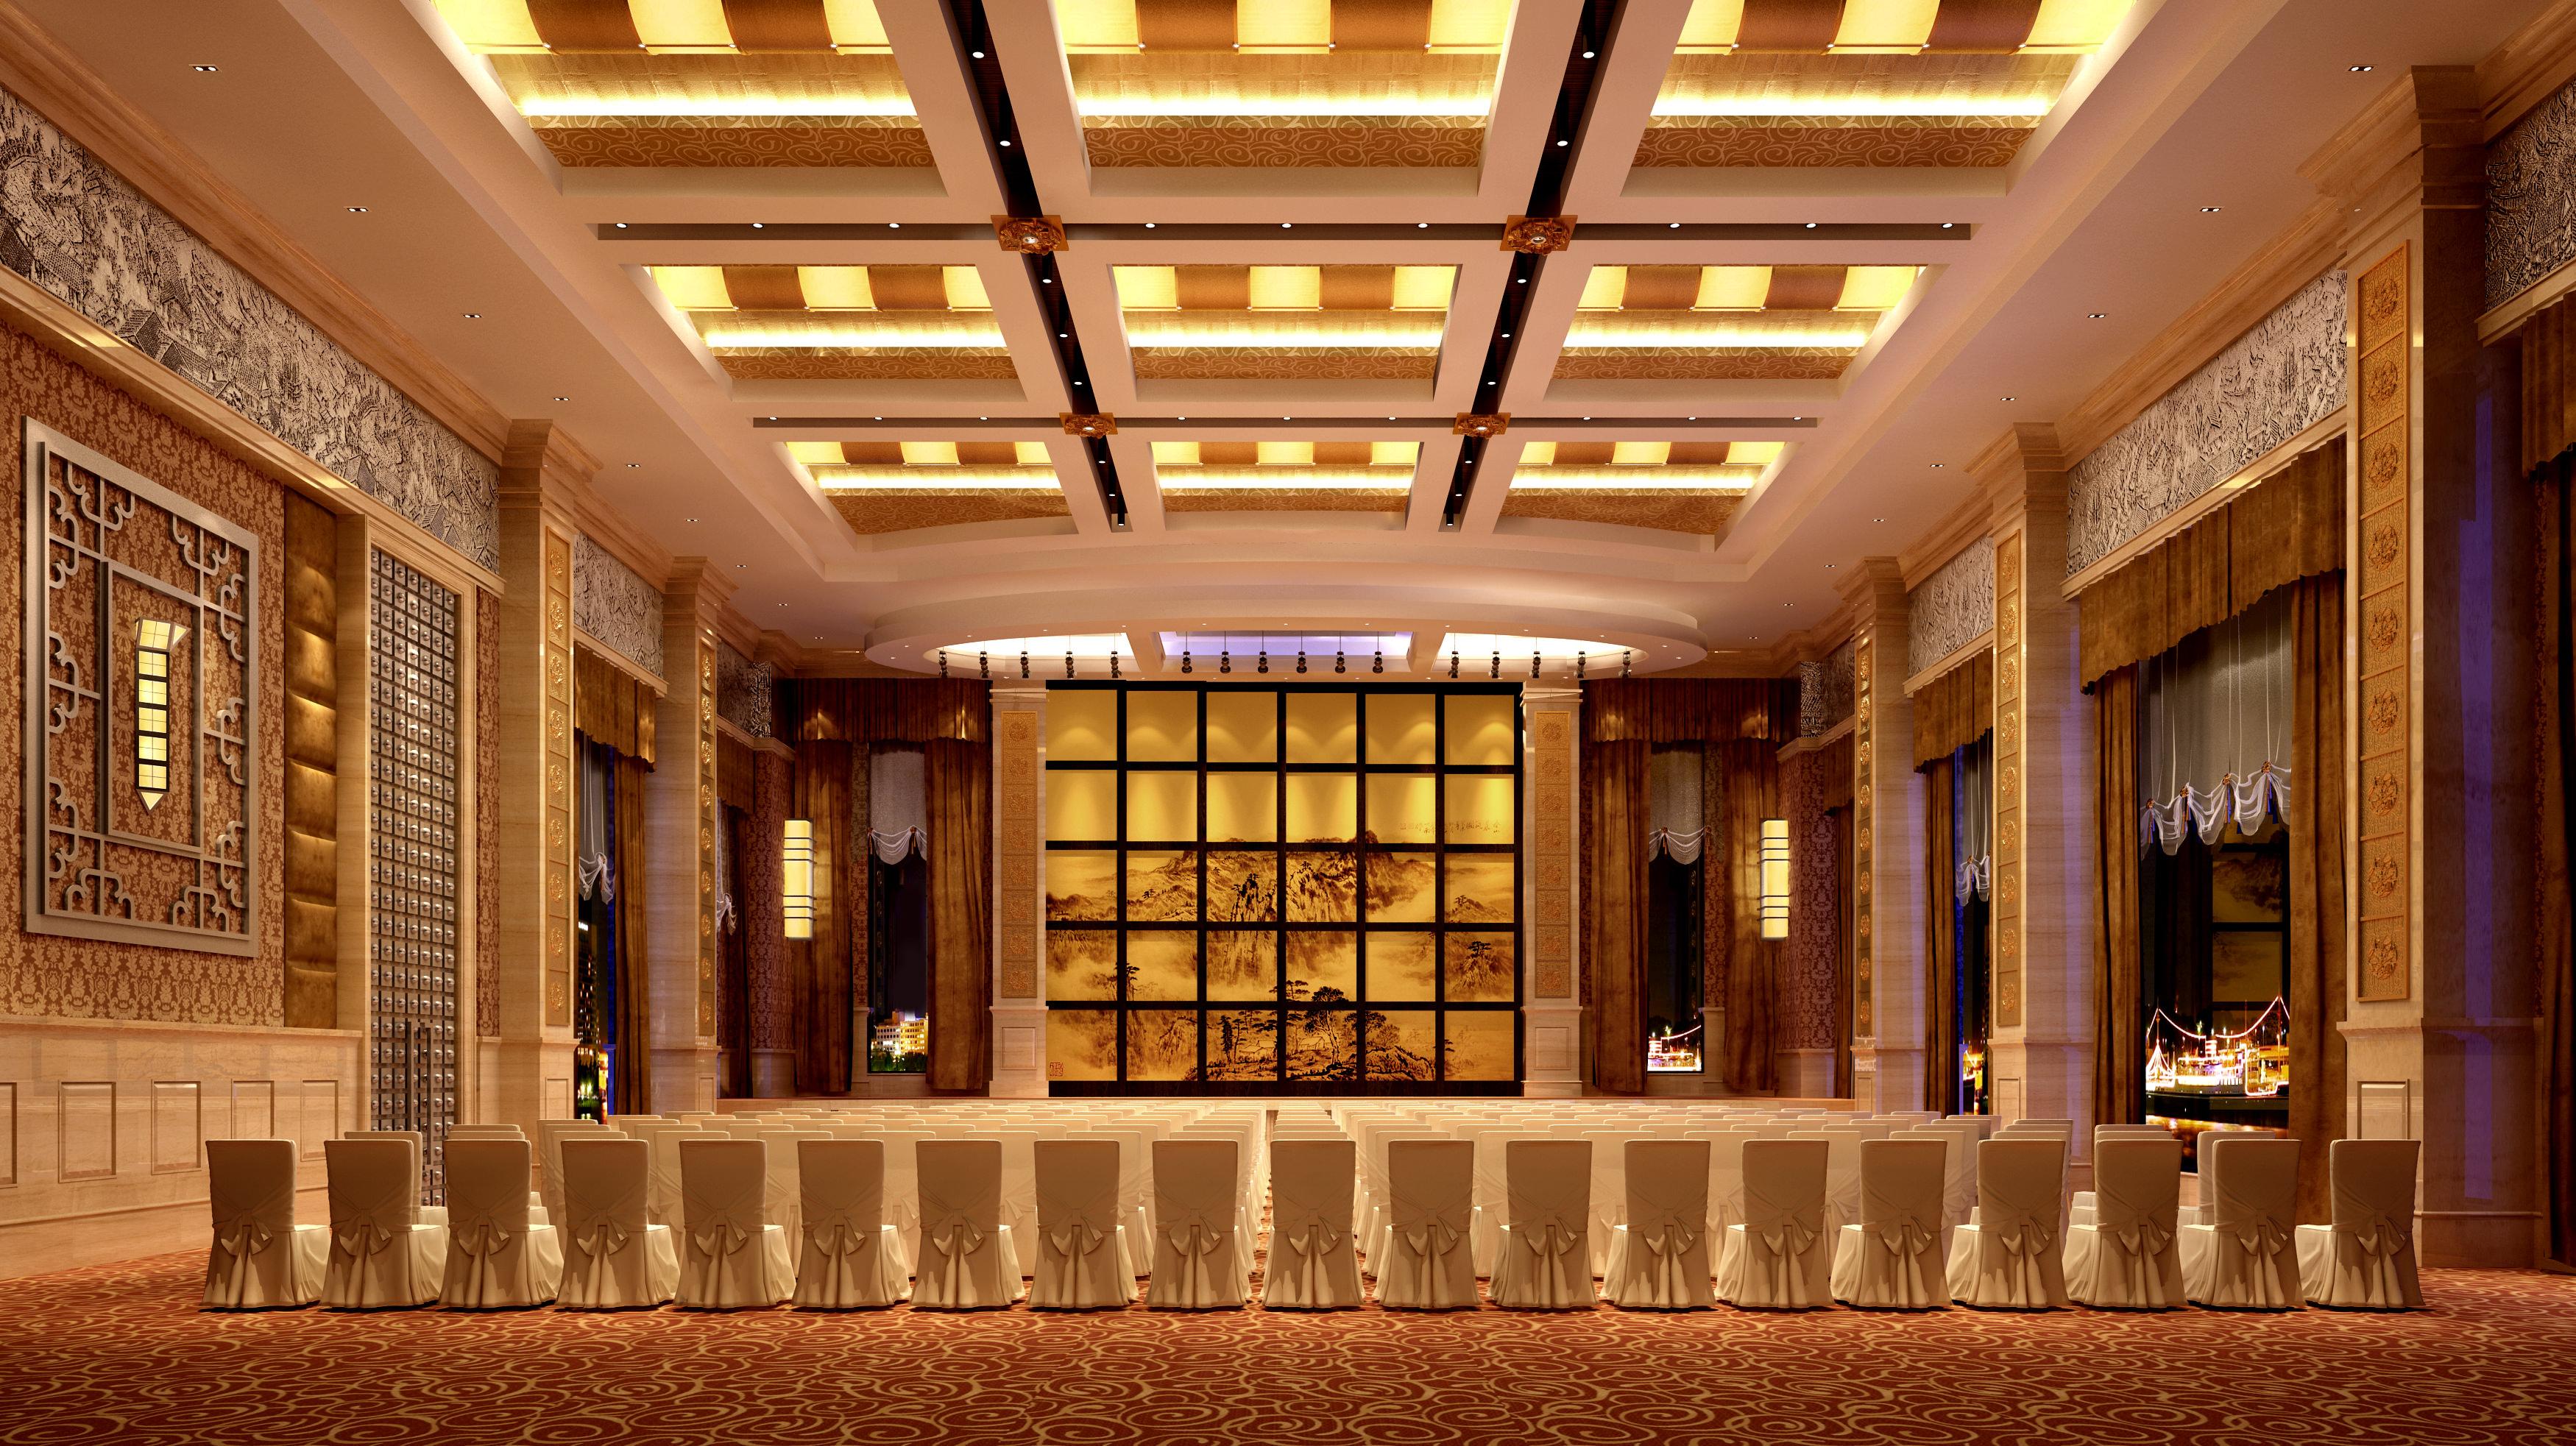 Banquet hall reception area download 3d house - Banquet Hall 3d Model